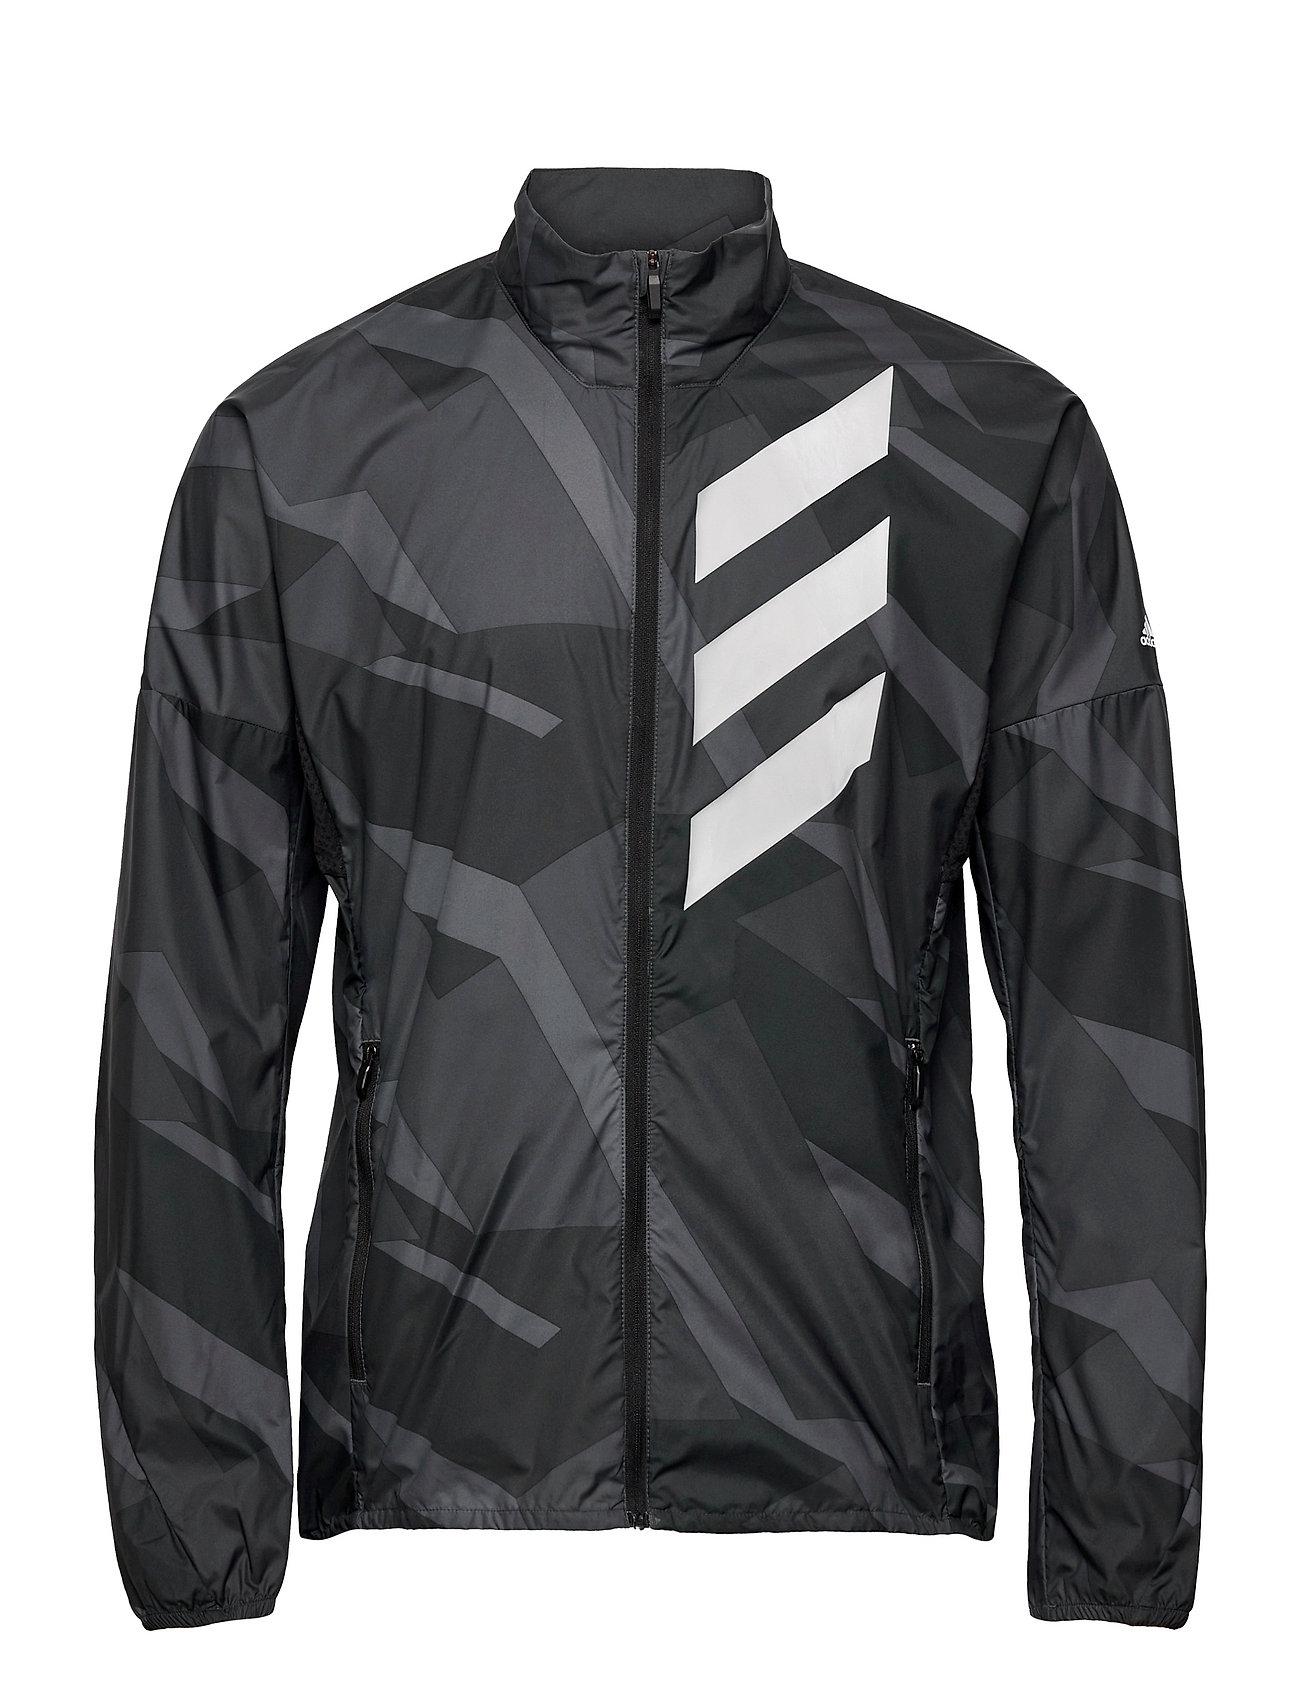 Terrex Parley Agravic Wind.Rdy Windbreaker Outerwear Sport Jackets Sort Adidas Performance